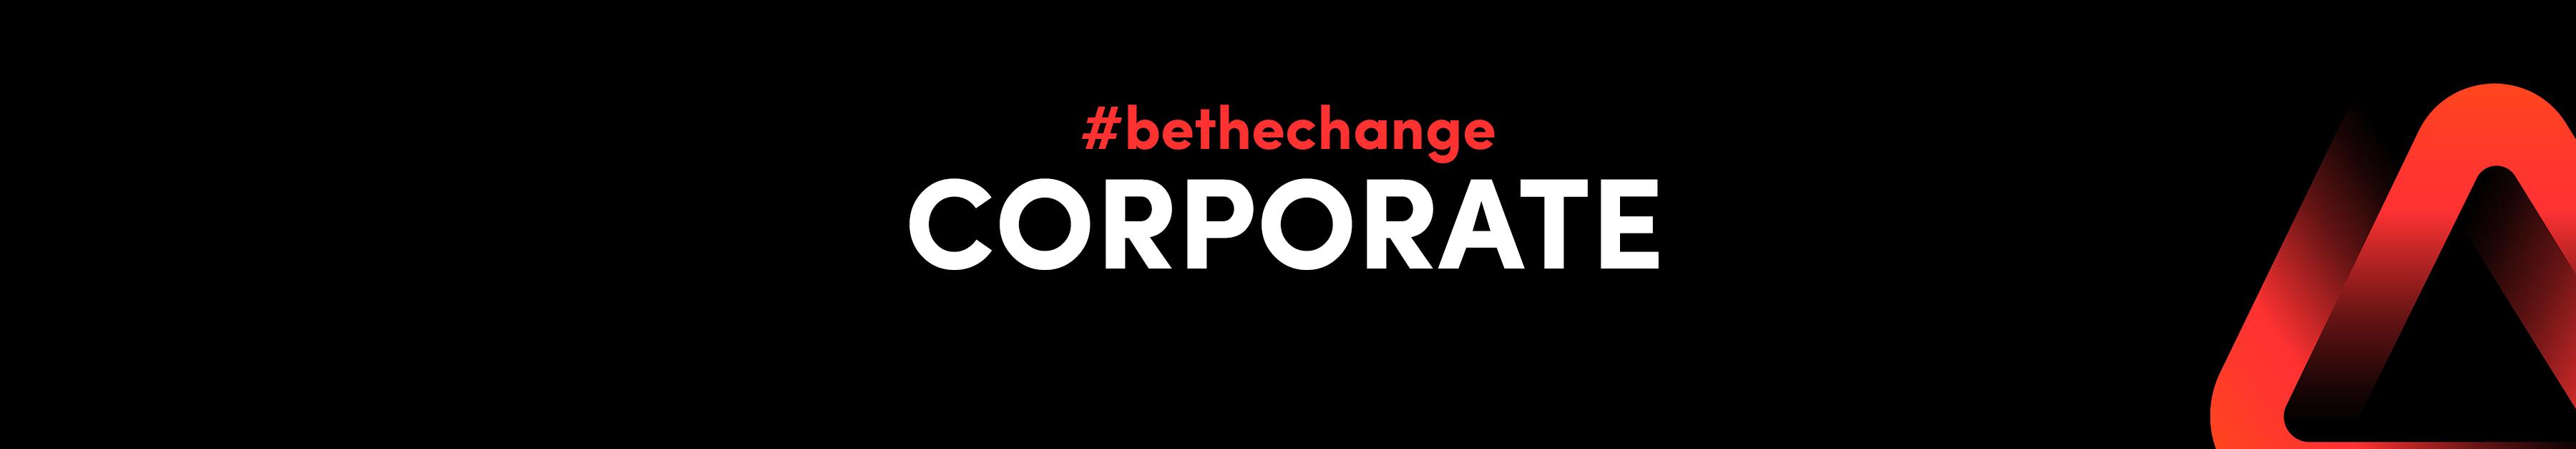 #bethechange Corporate - Membership as a company 1